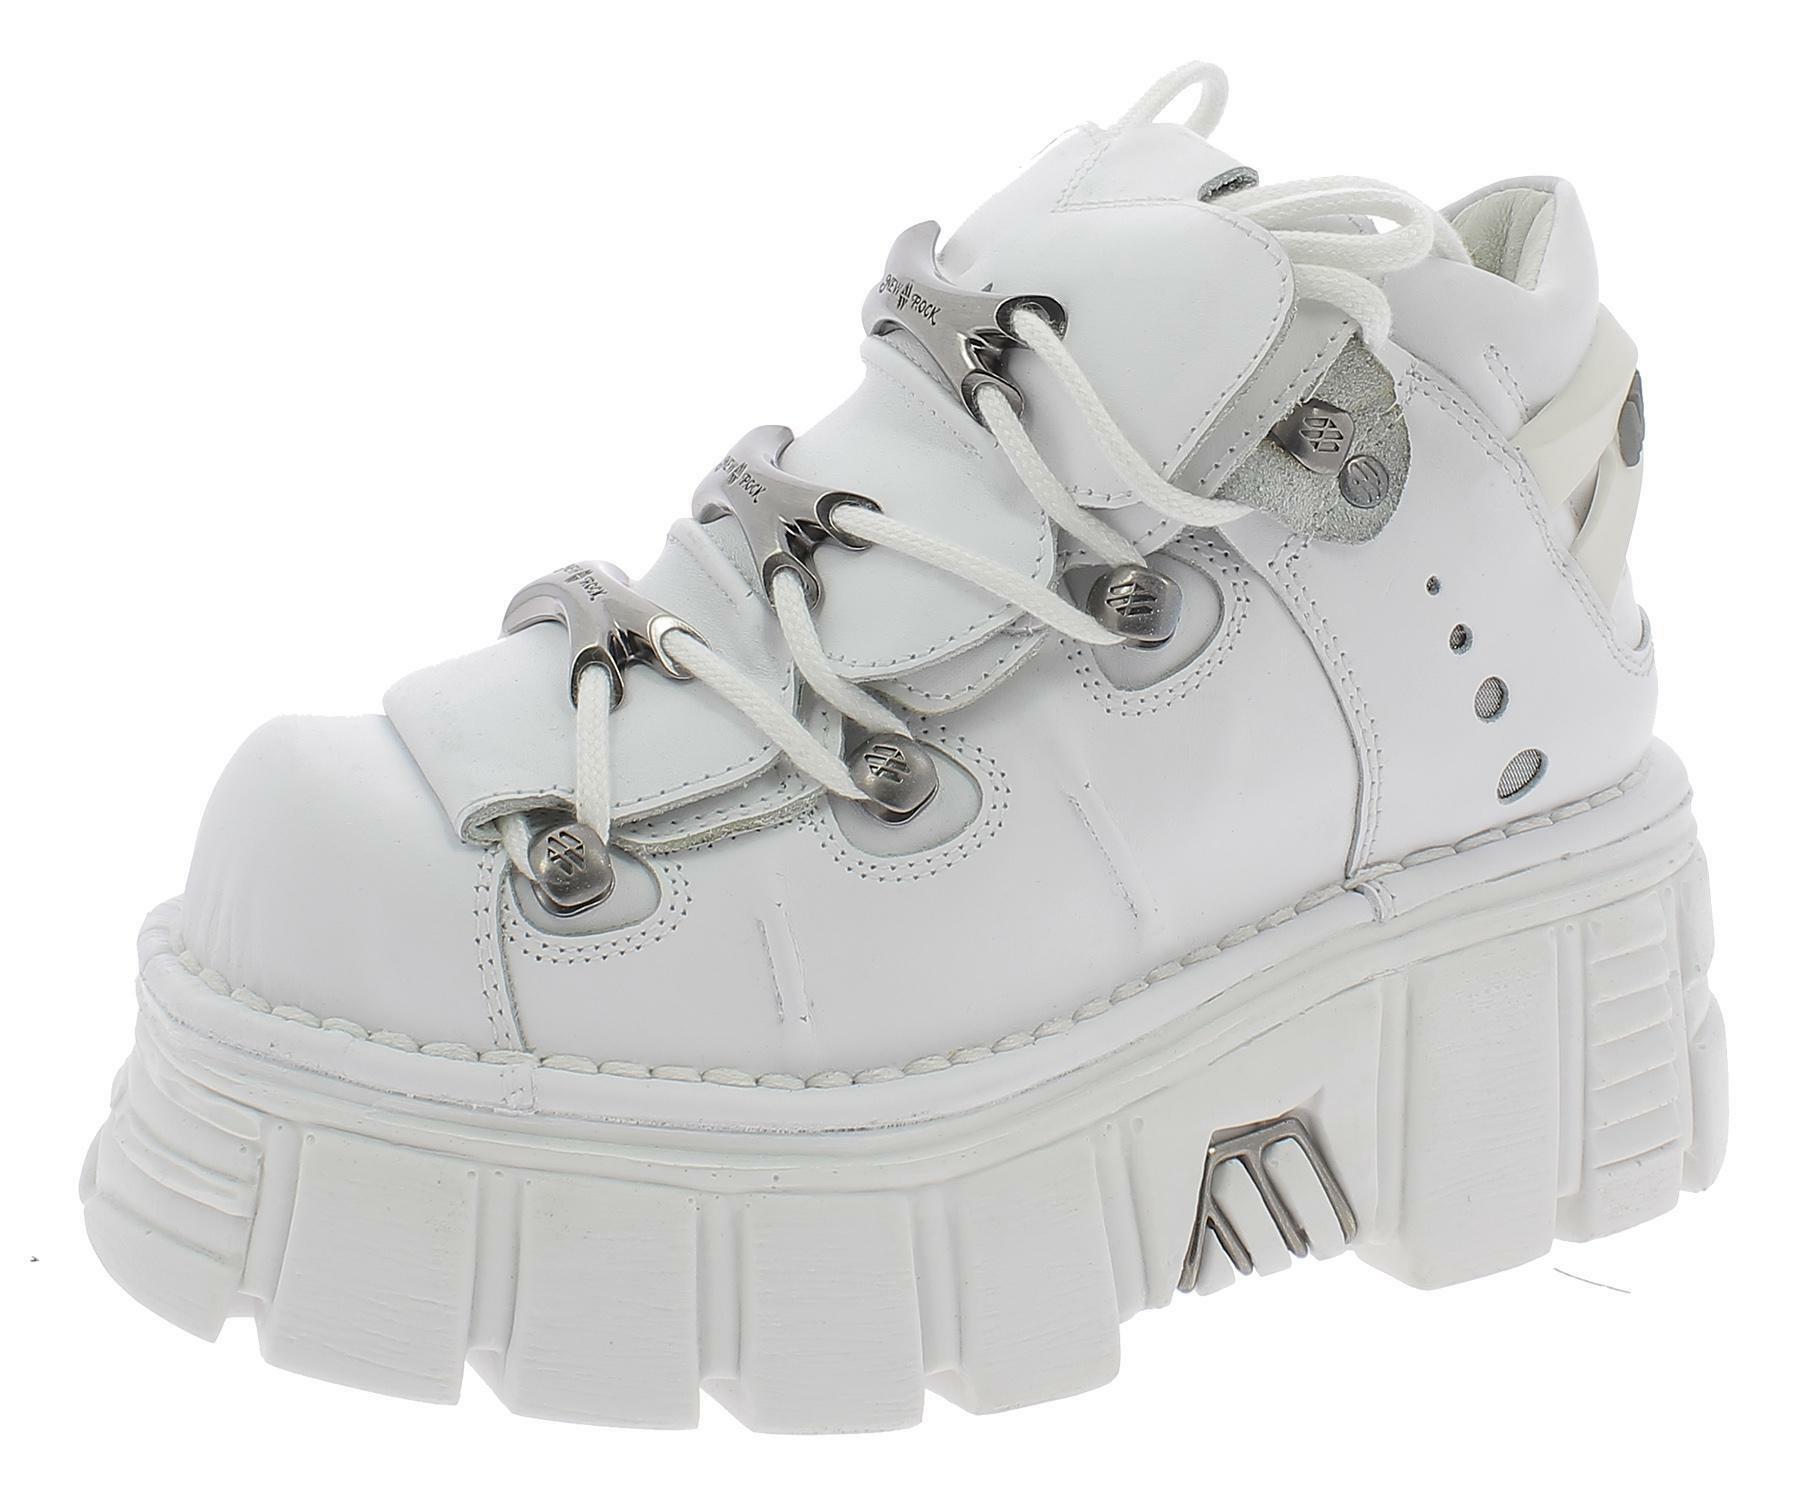 huge discount 50f72 f8ce4 New rock continental scarpe donna bianche m106c65